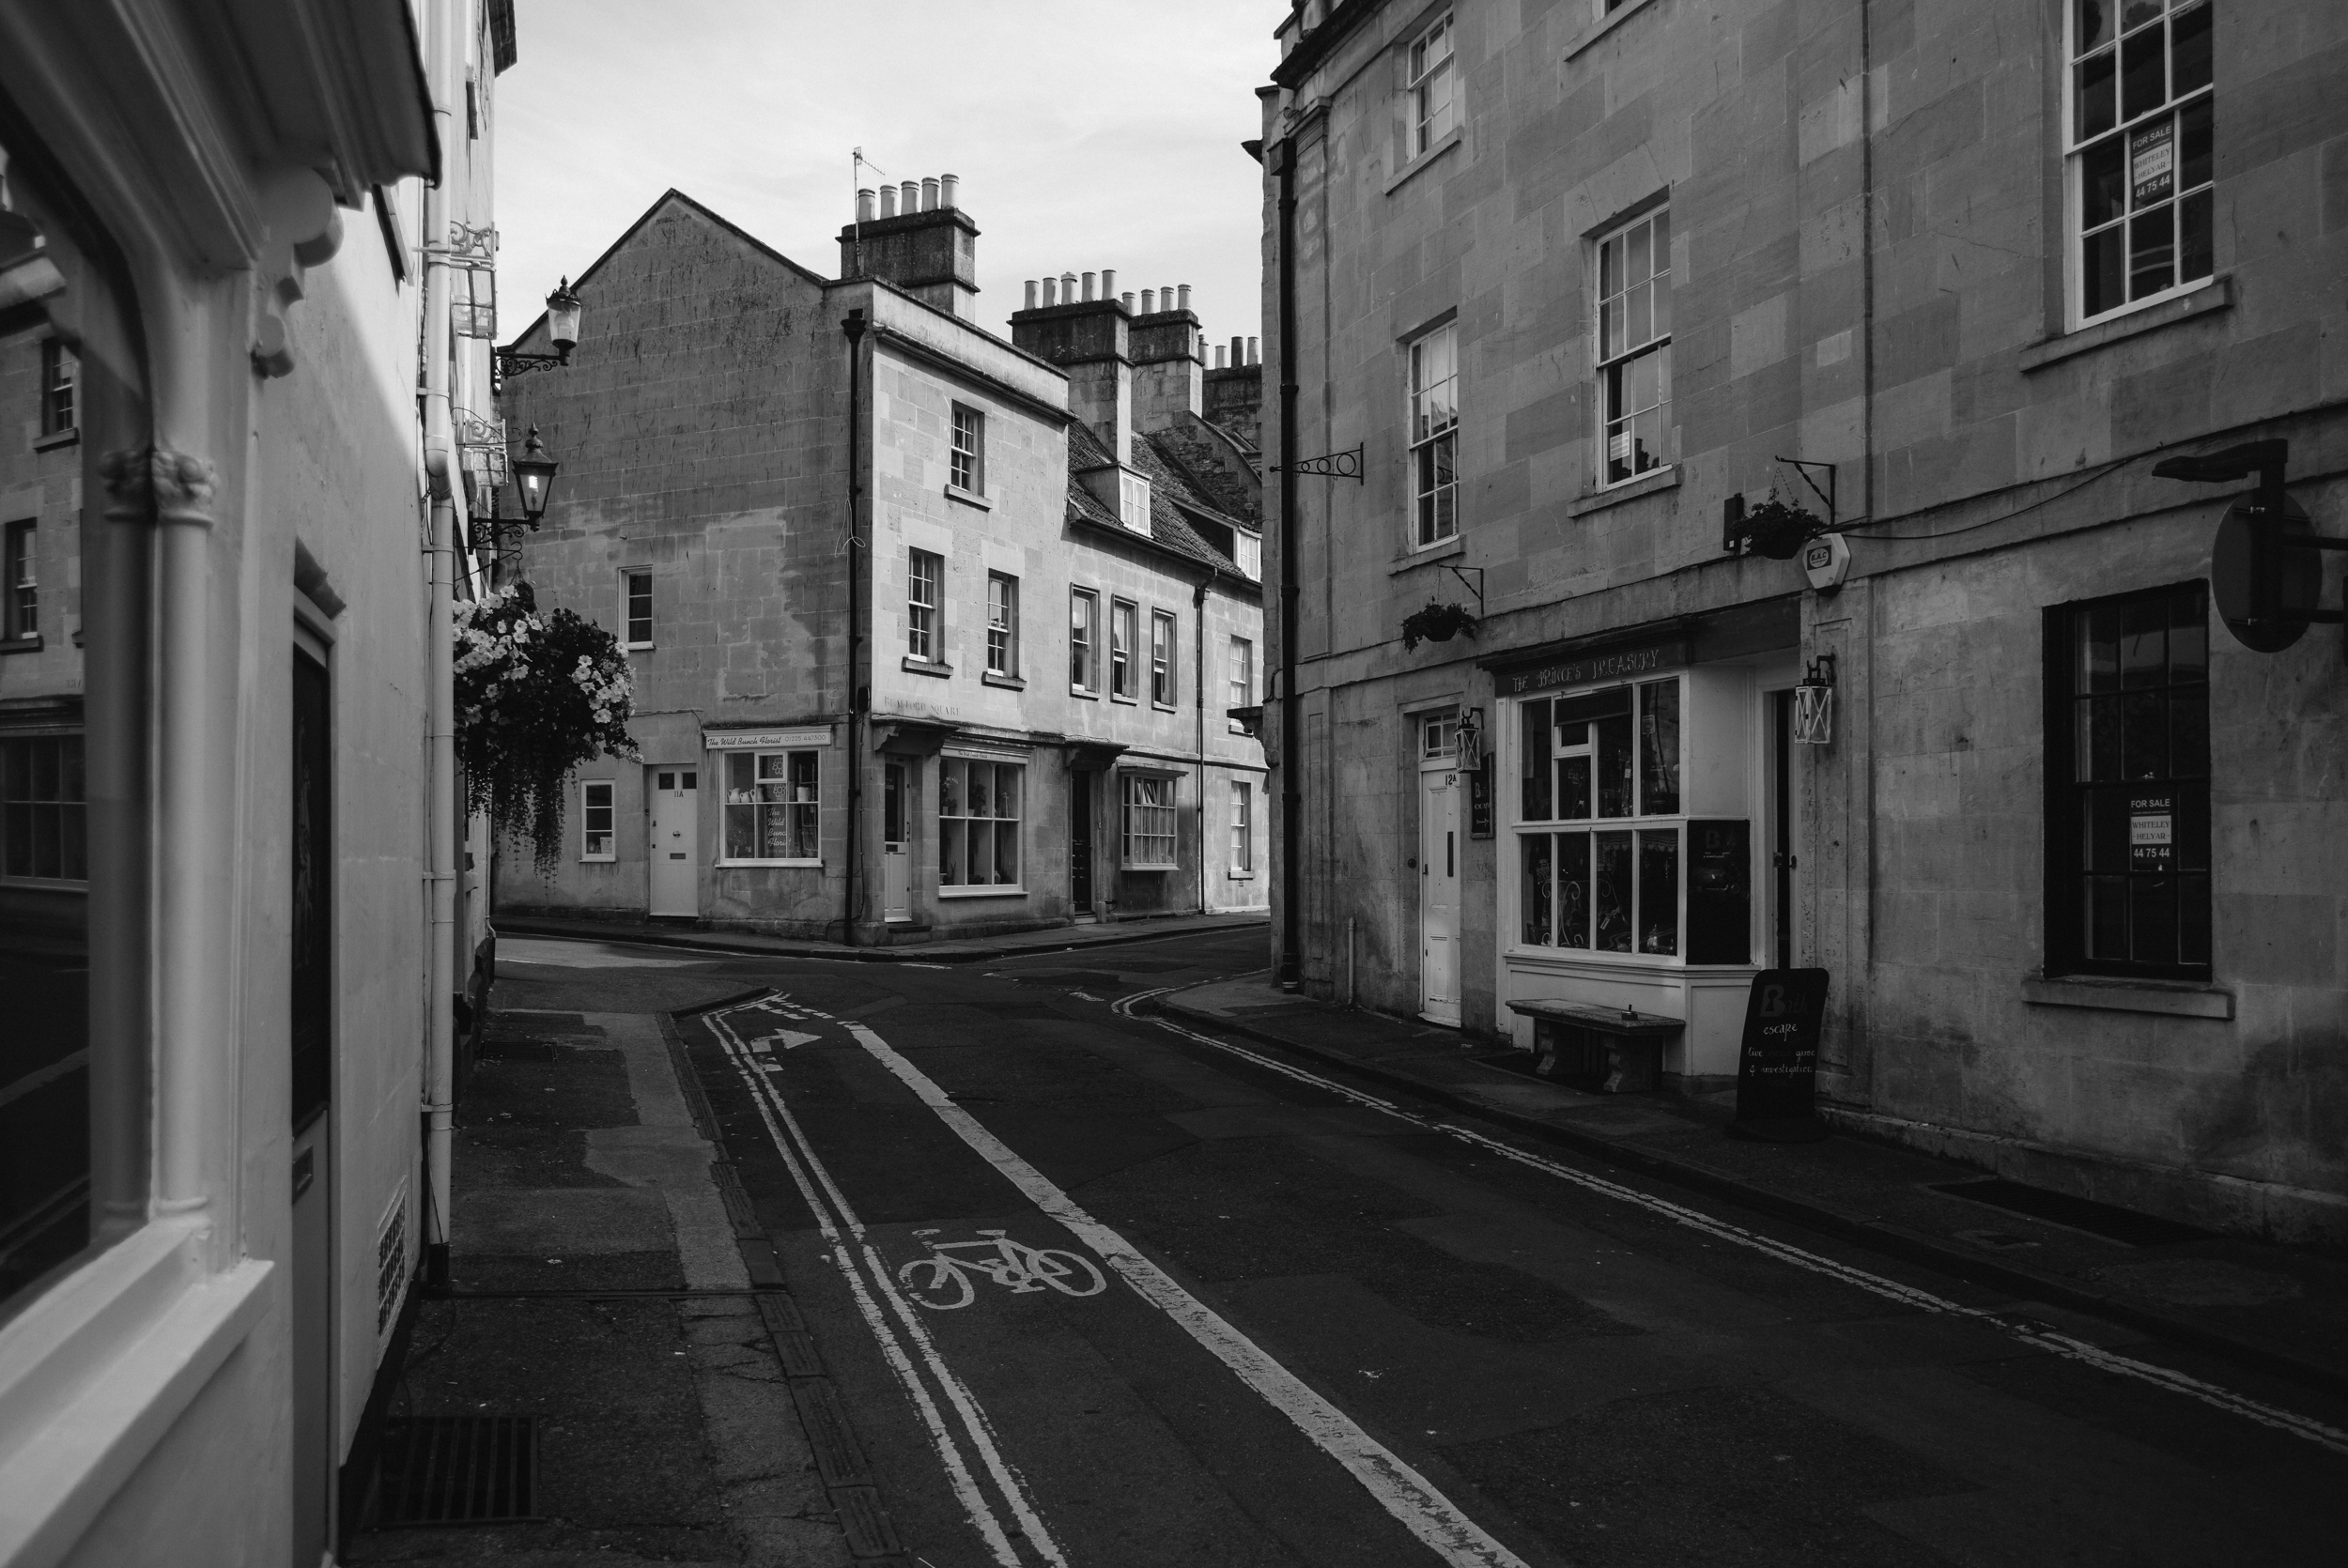 Alleyways in Bath